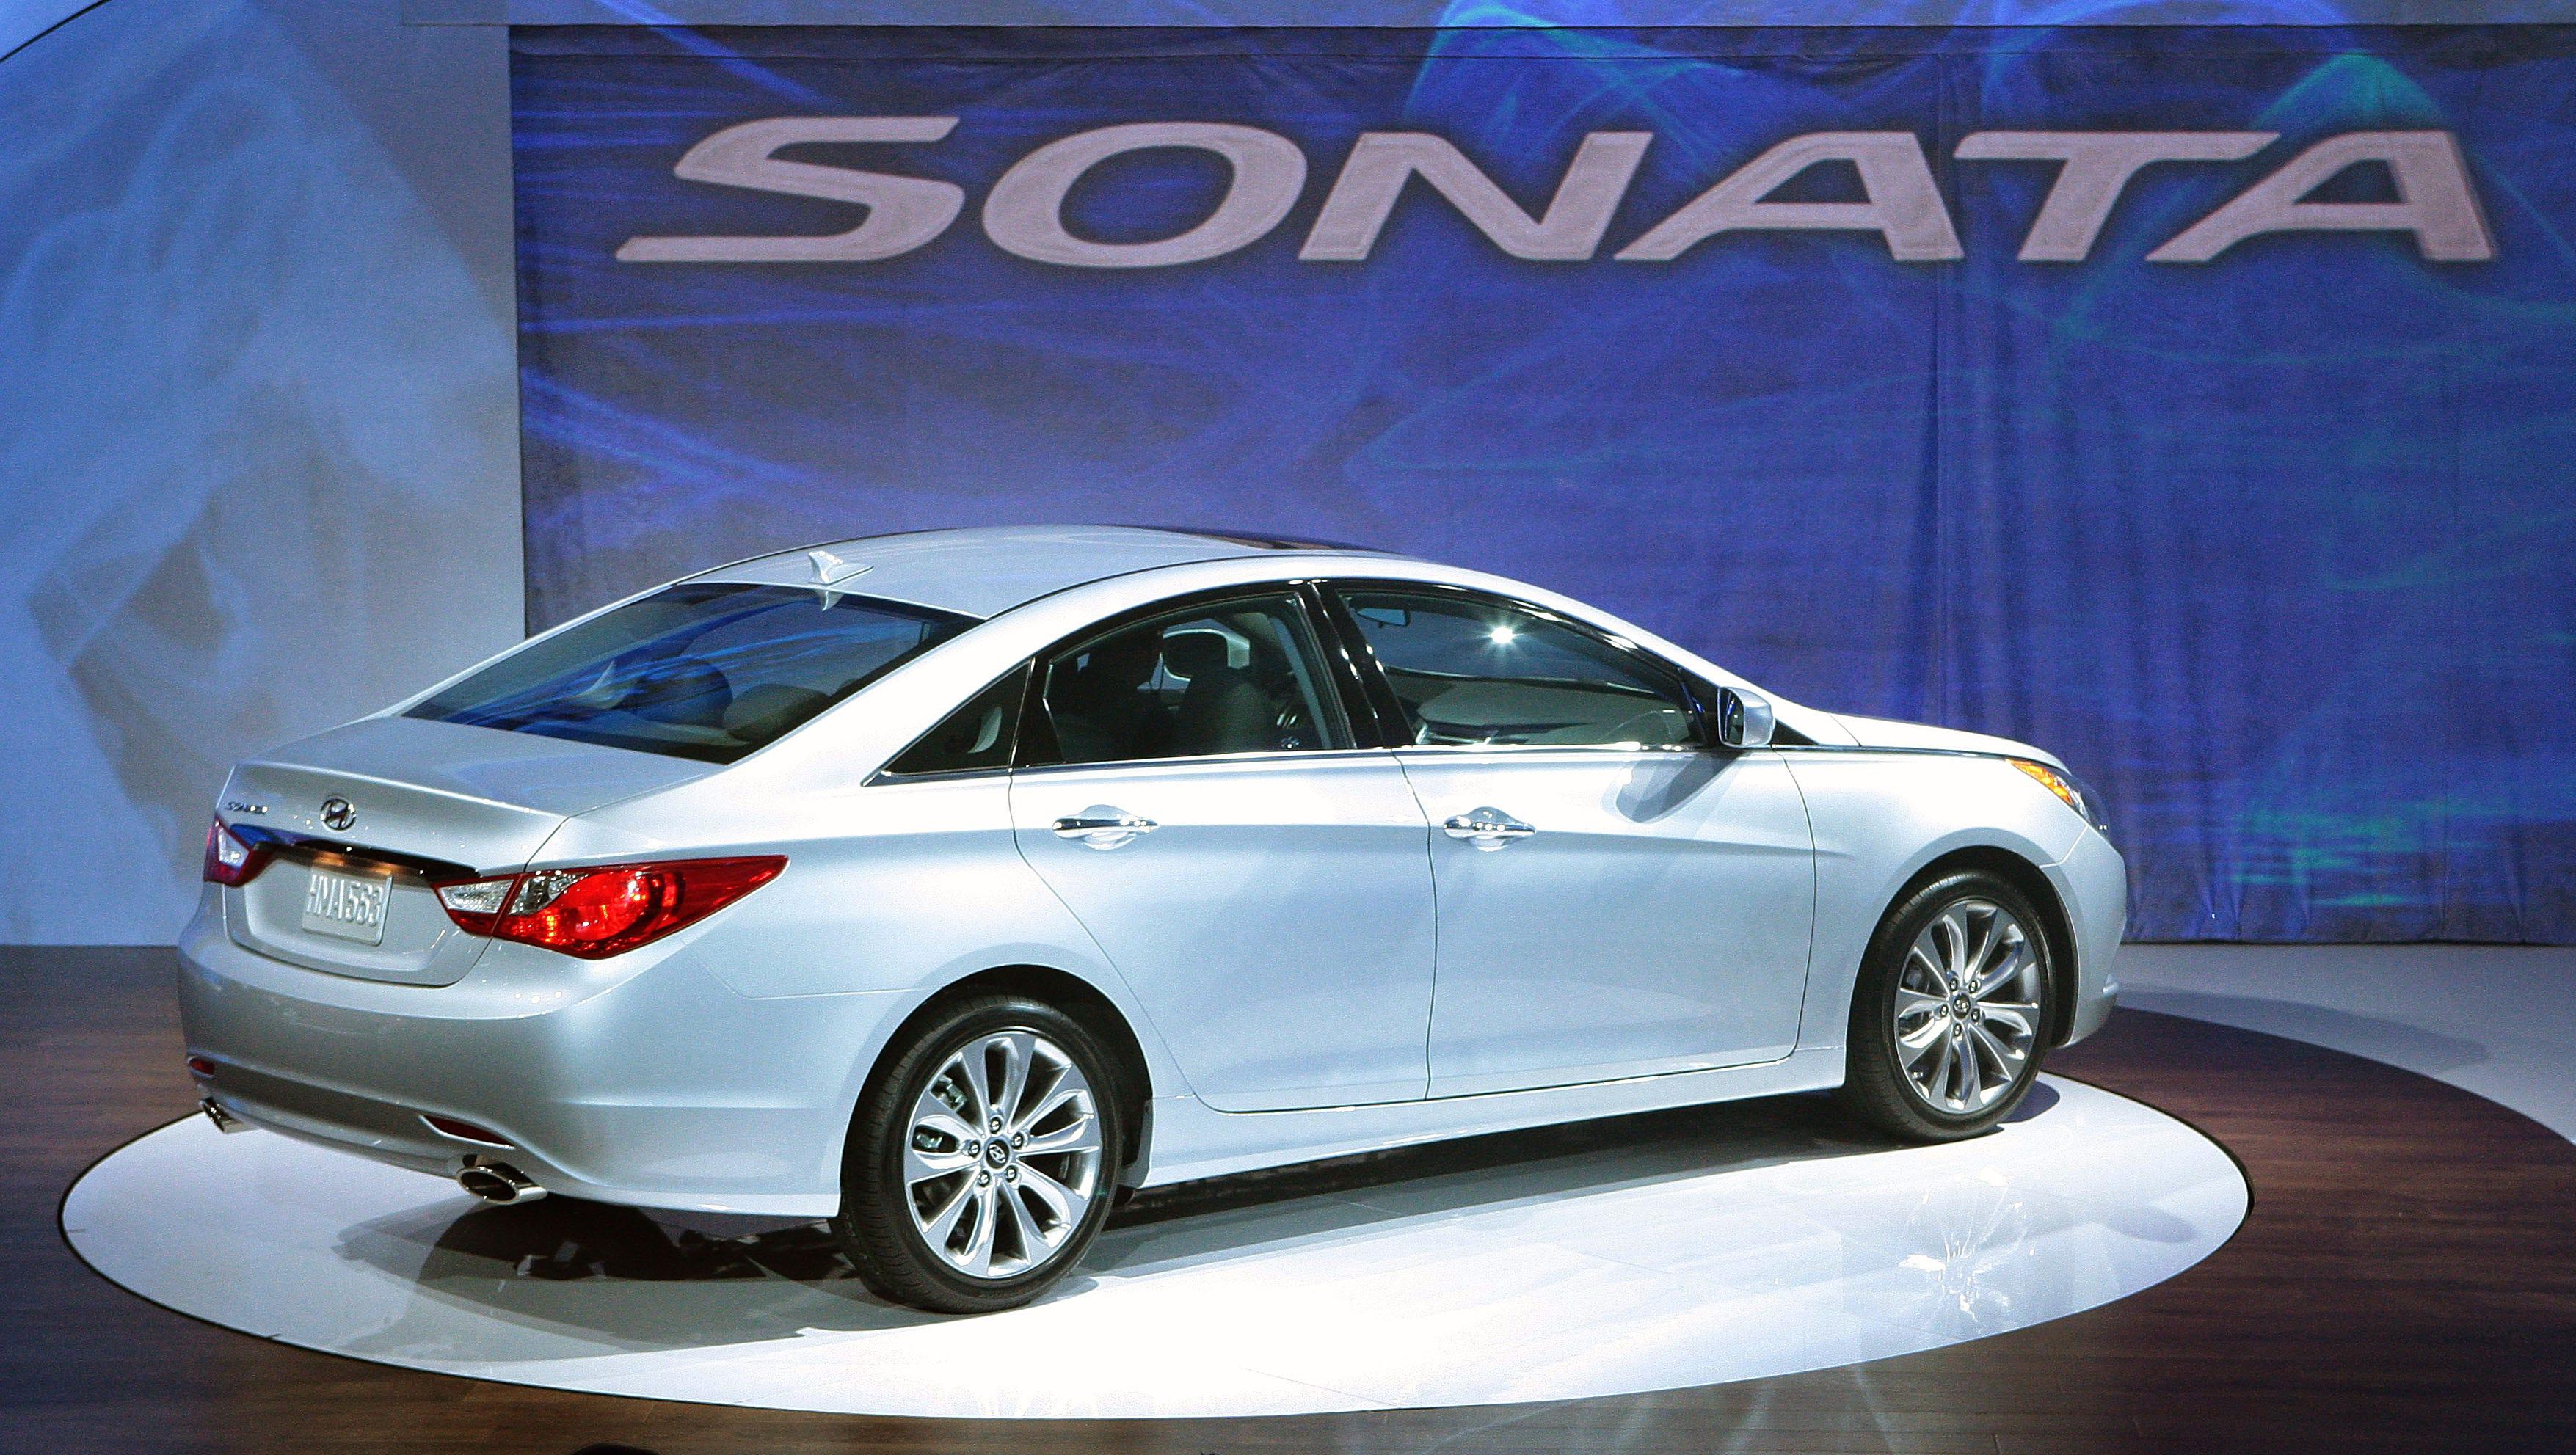 2002 Hyundai Sonata Transmission Problems